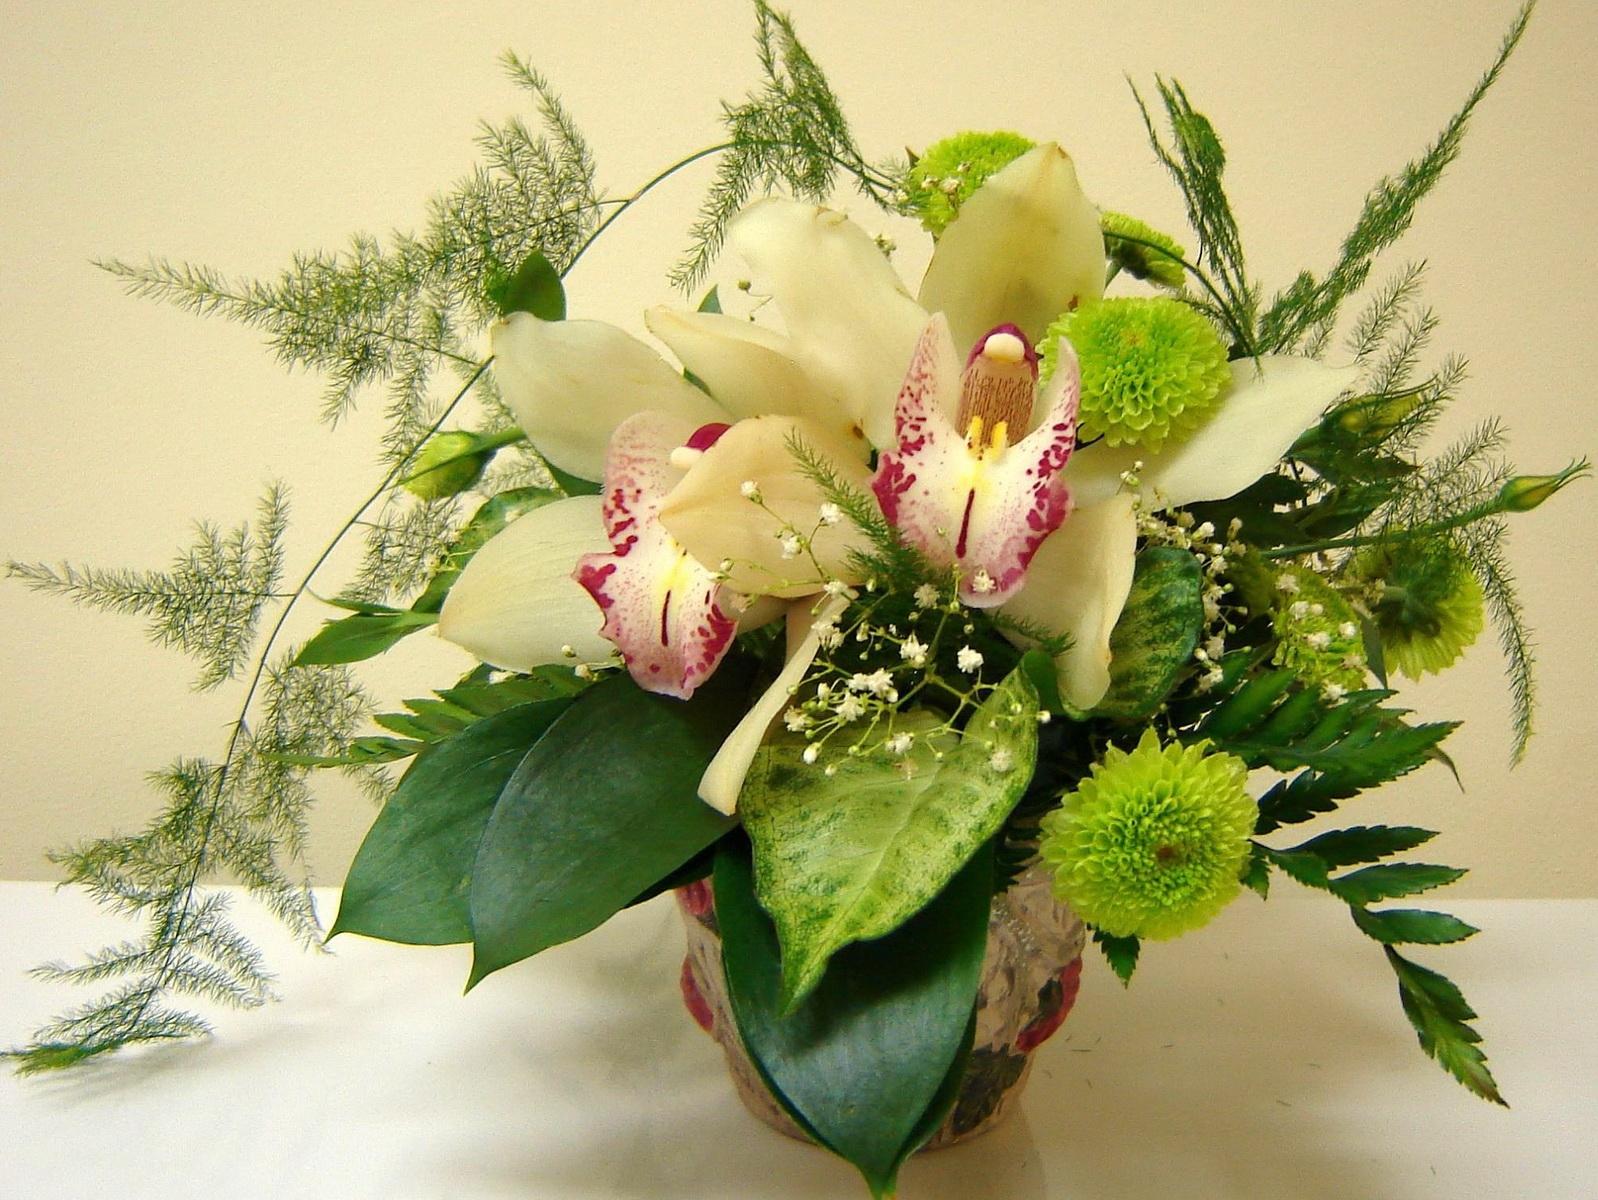 Hintergrundbilder orchideen gr n bl hen chrysanthemen kunst blume flora strau vase - Orchideen arrangement ...